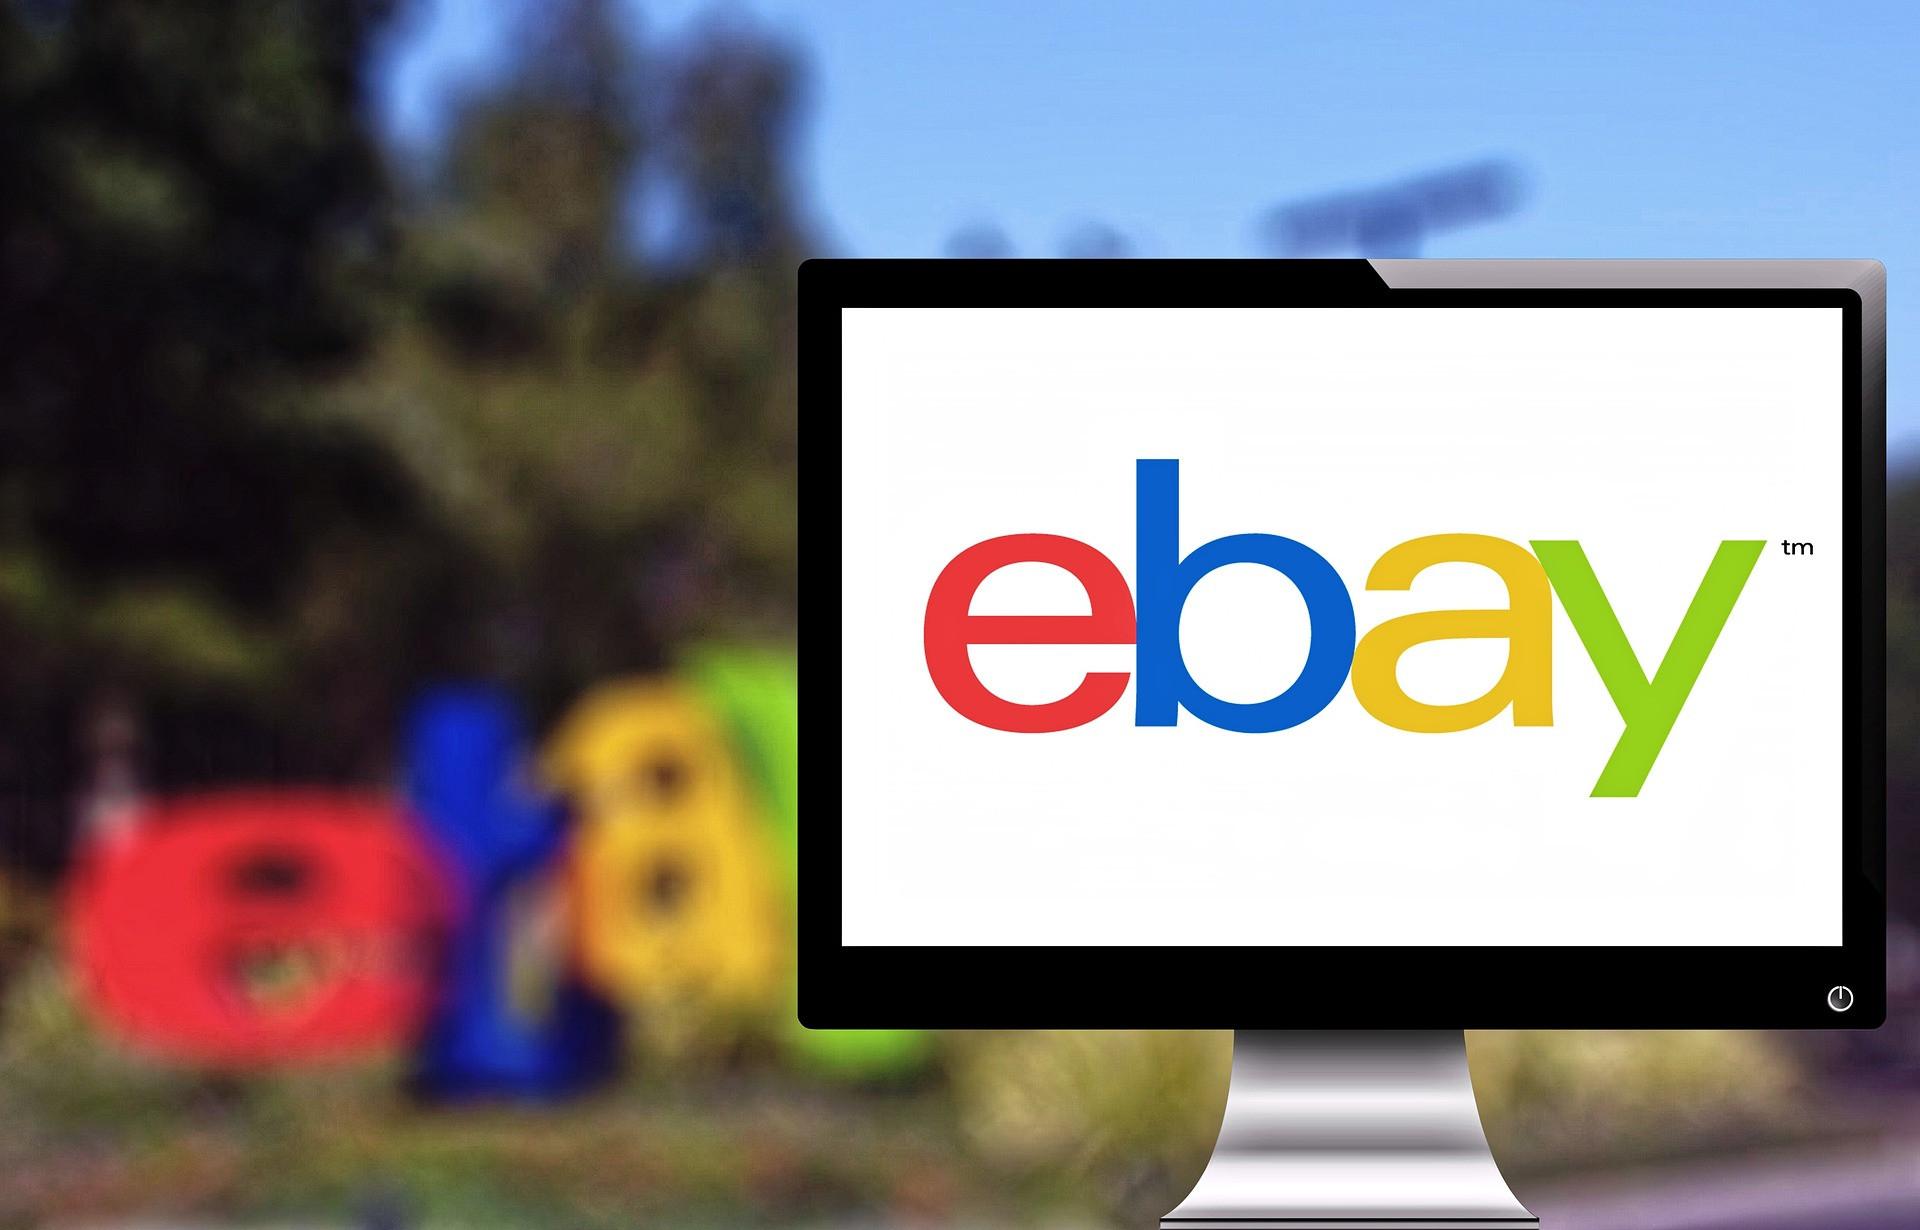 Retract Bid Ebay A Tutorial On How To Retract A Bid On Ebay Tripboba Com